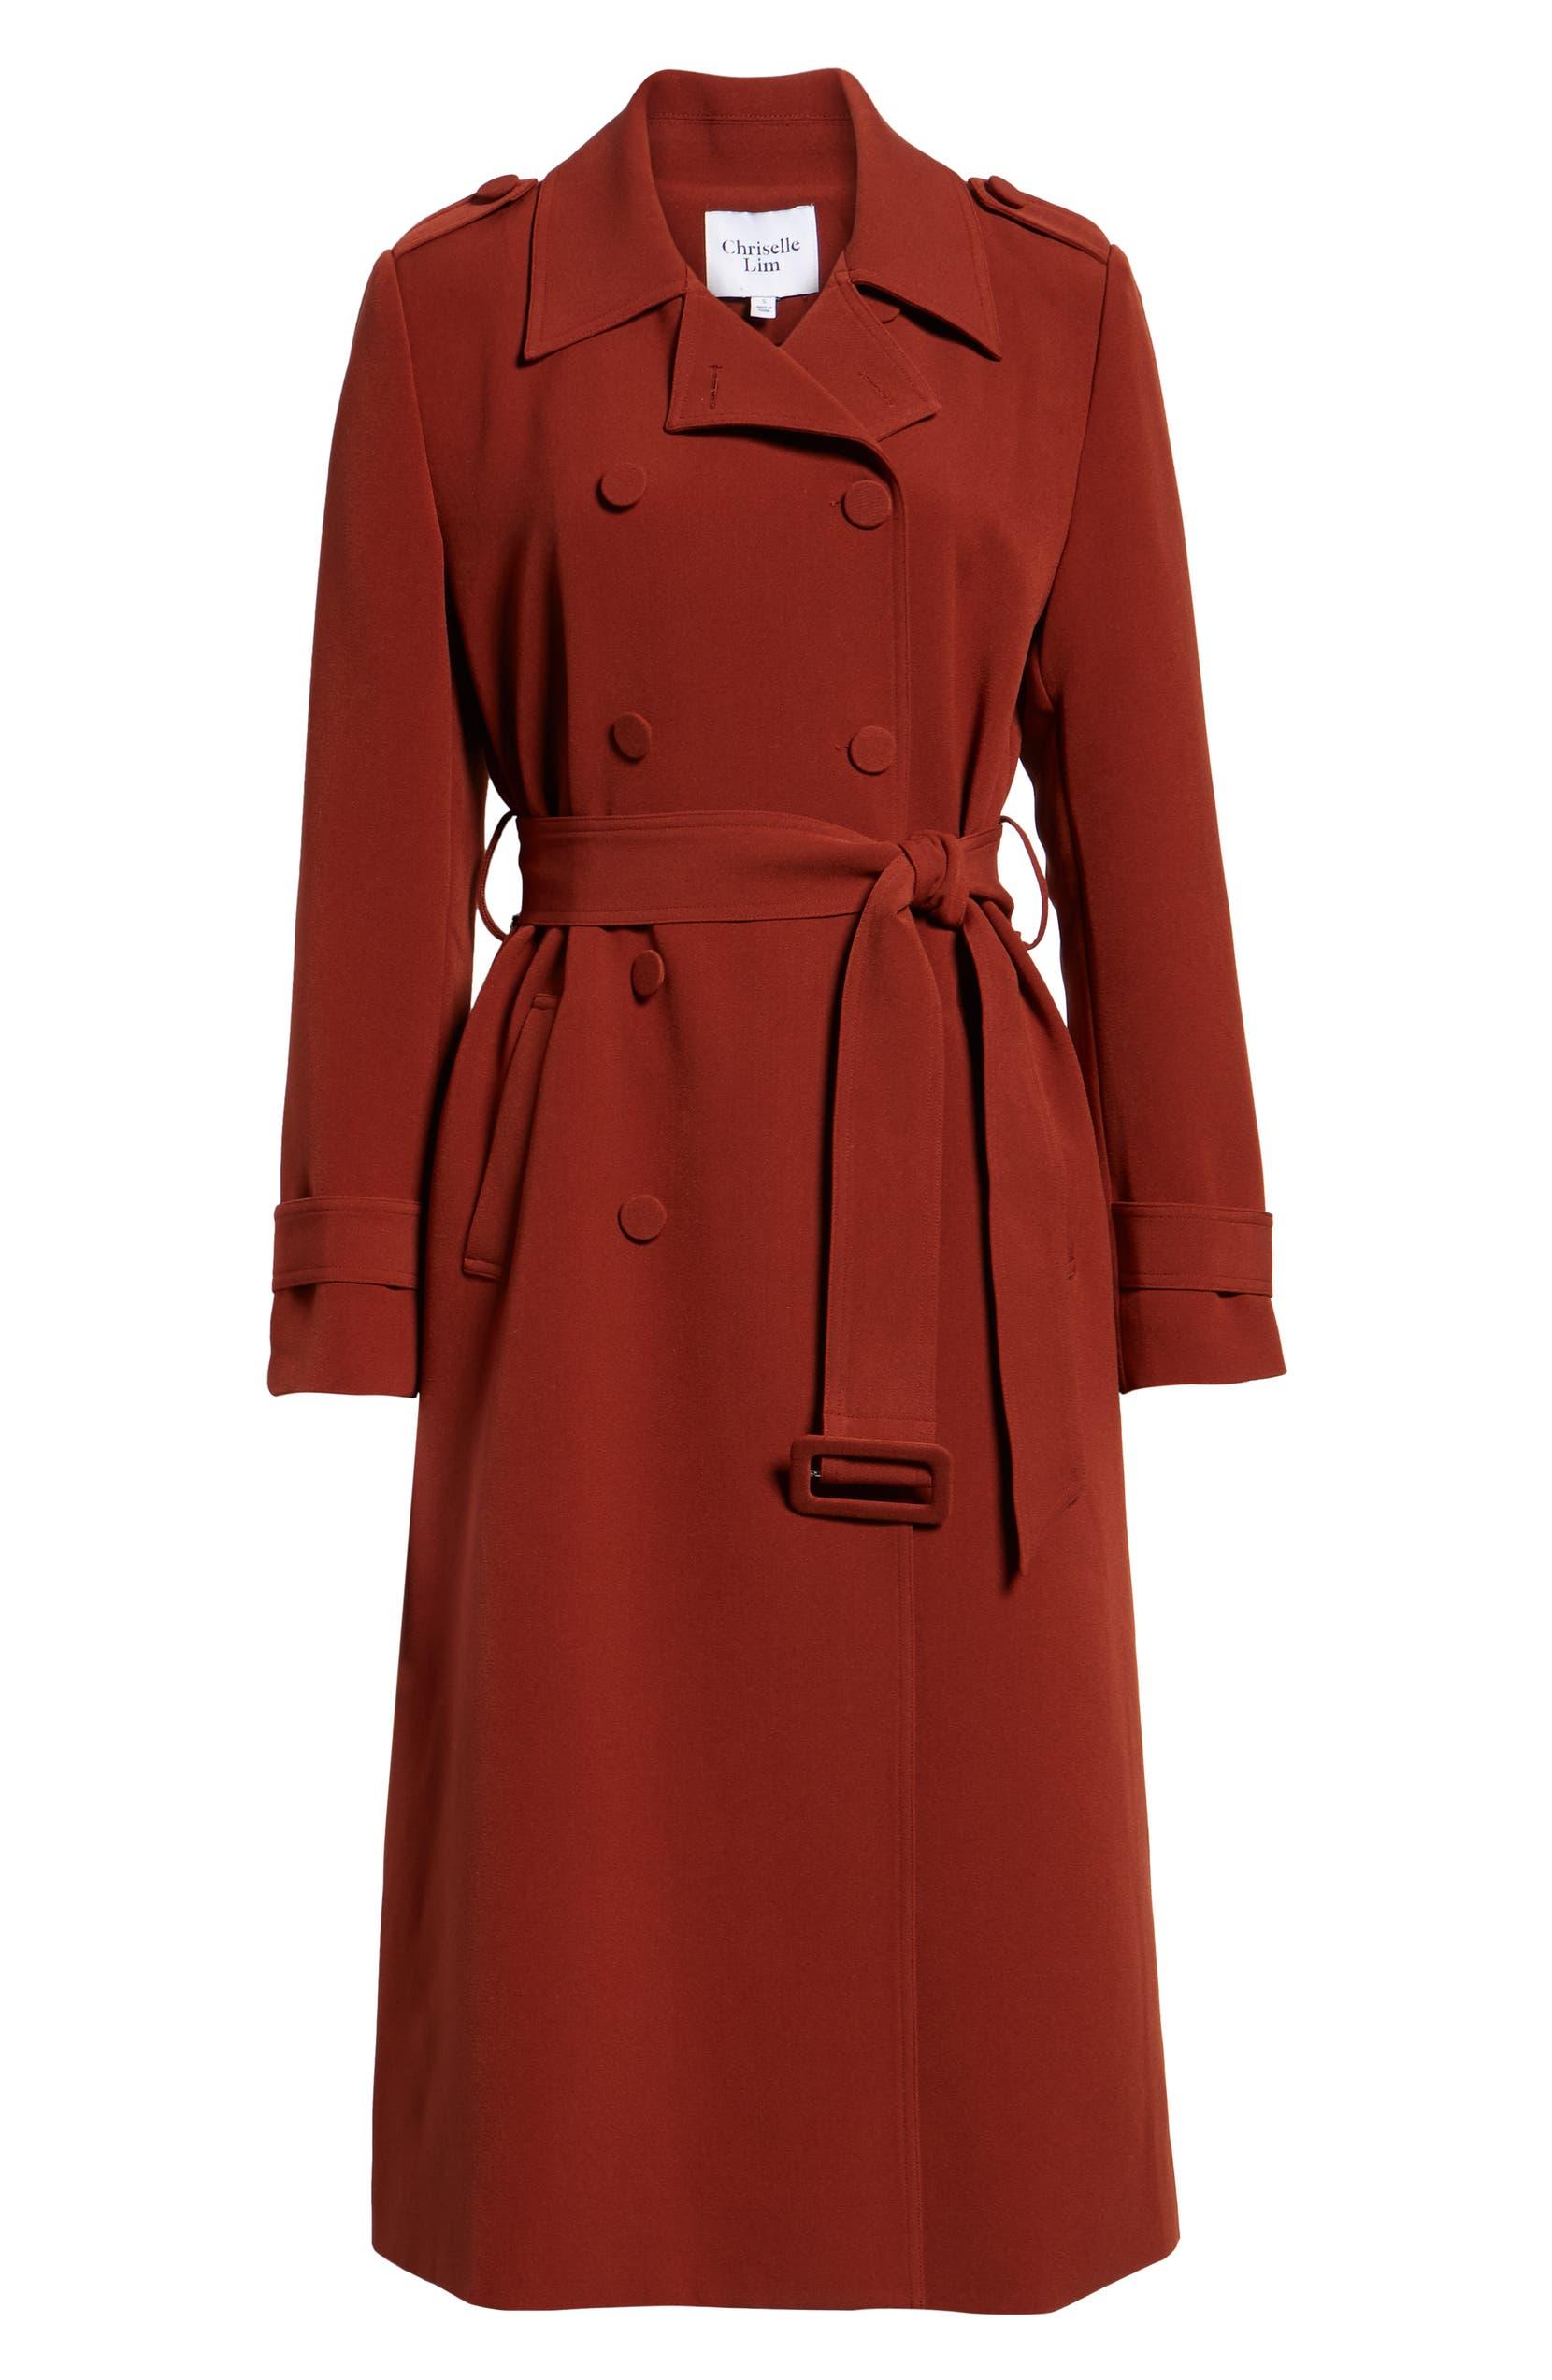 b4f6628940 Chriselle Lim Chloe Trench Coat